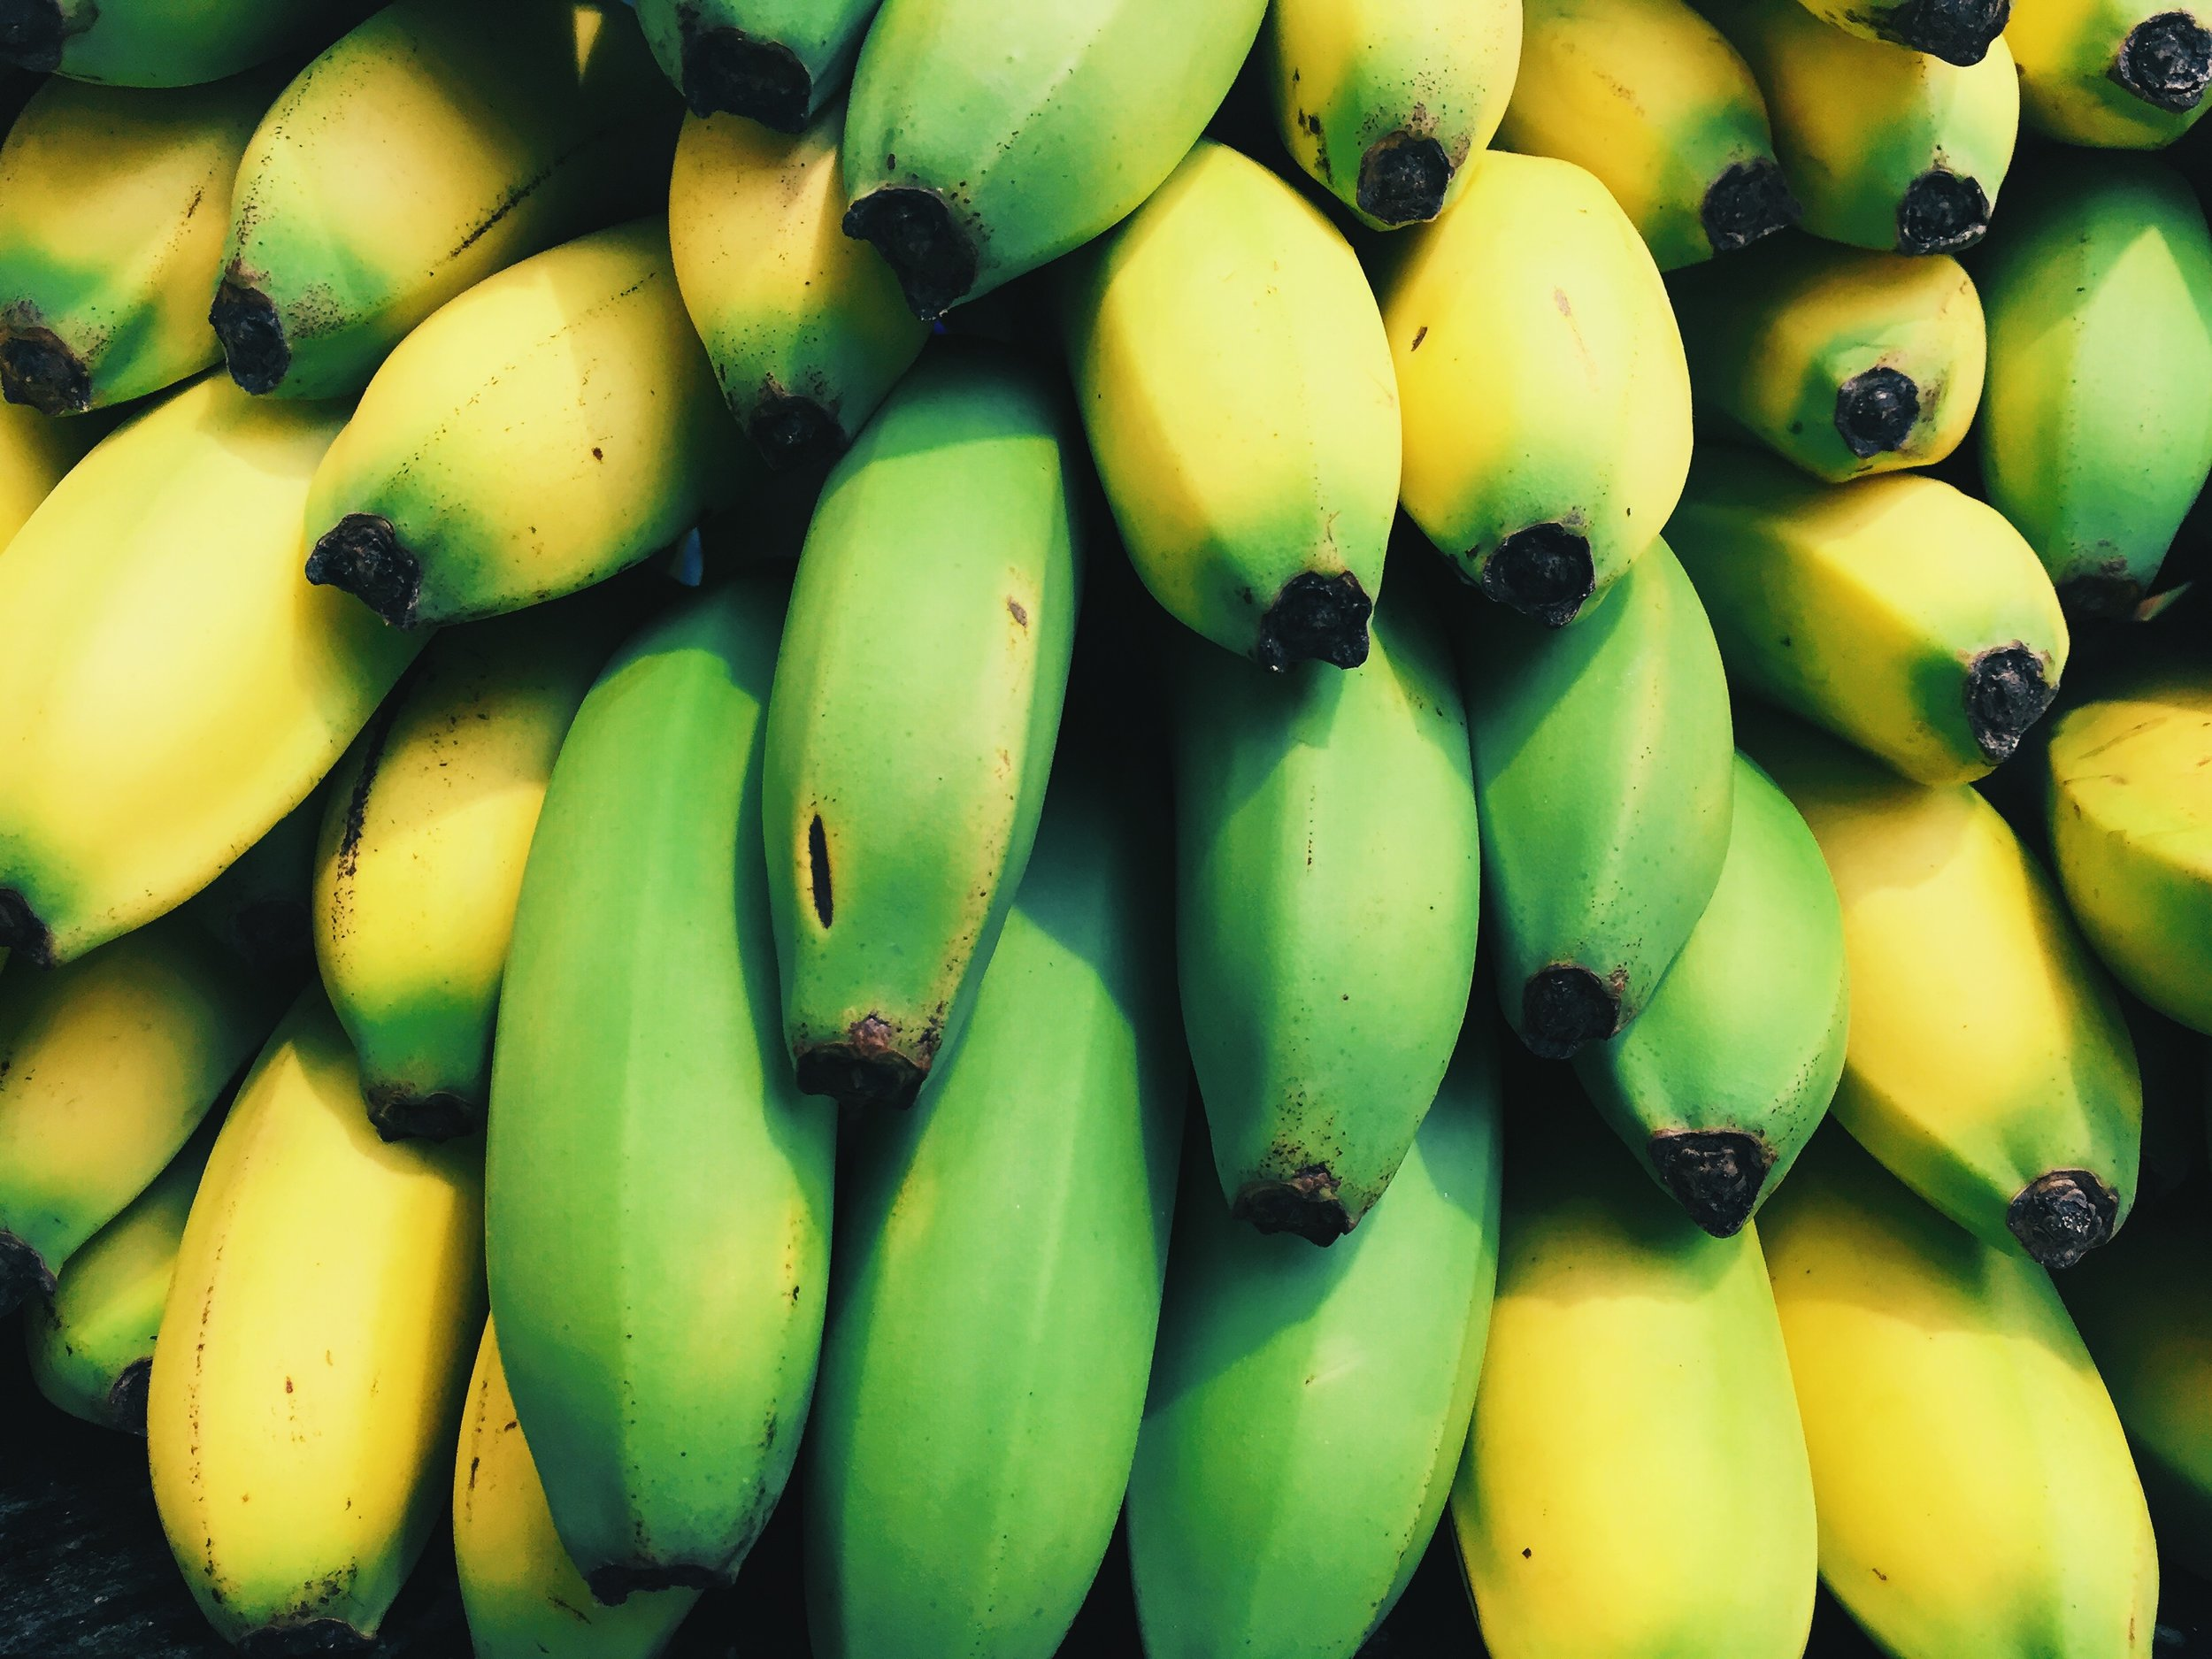 Turn bananas into a creamy dessert!